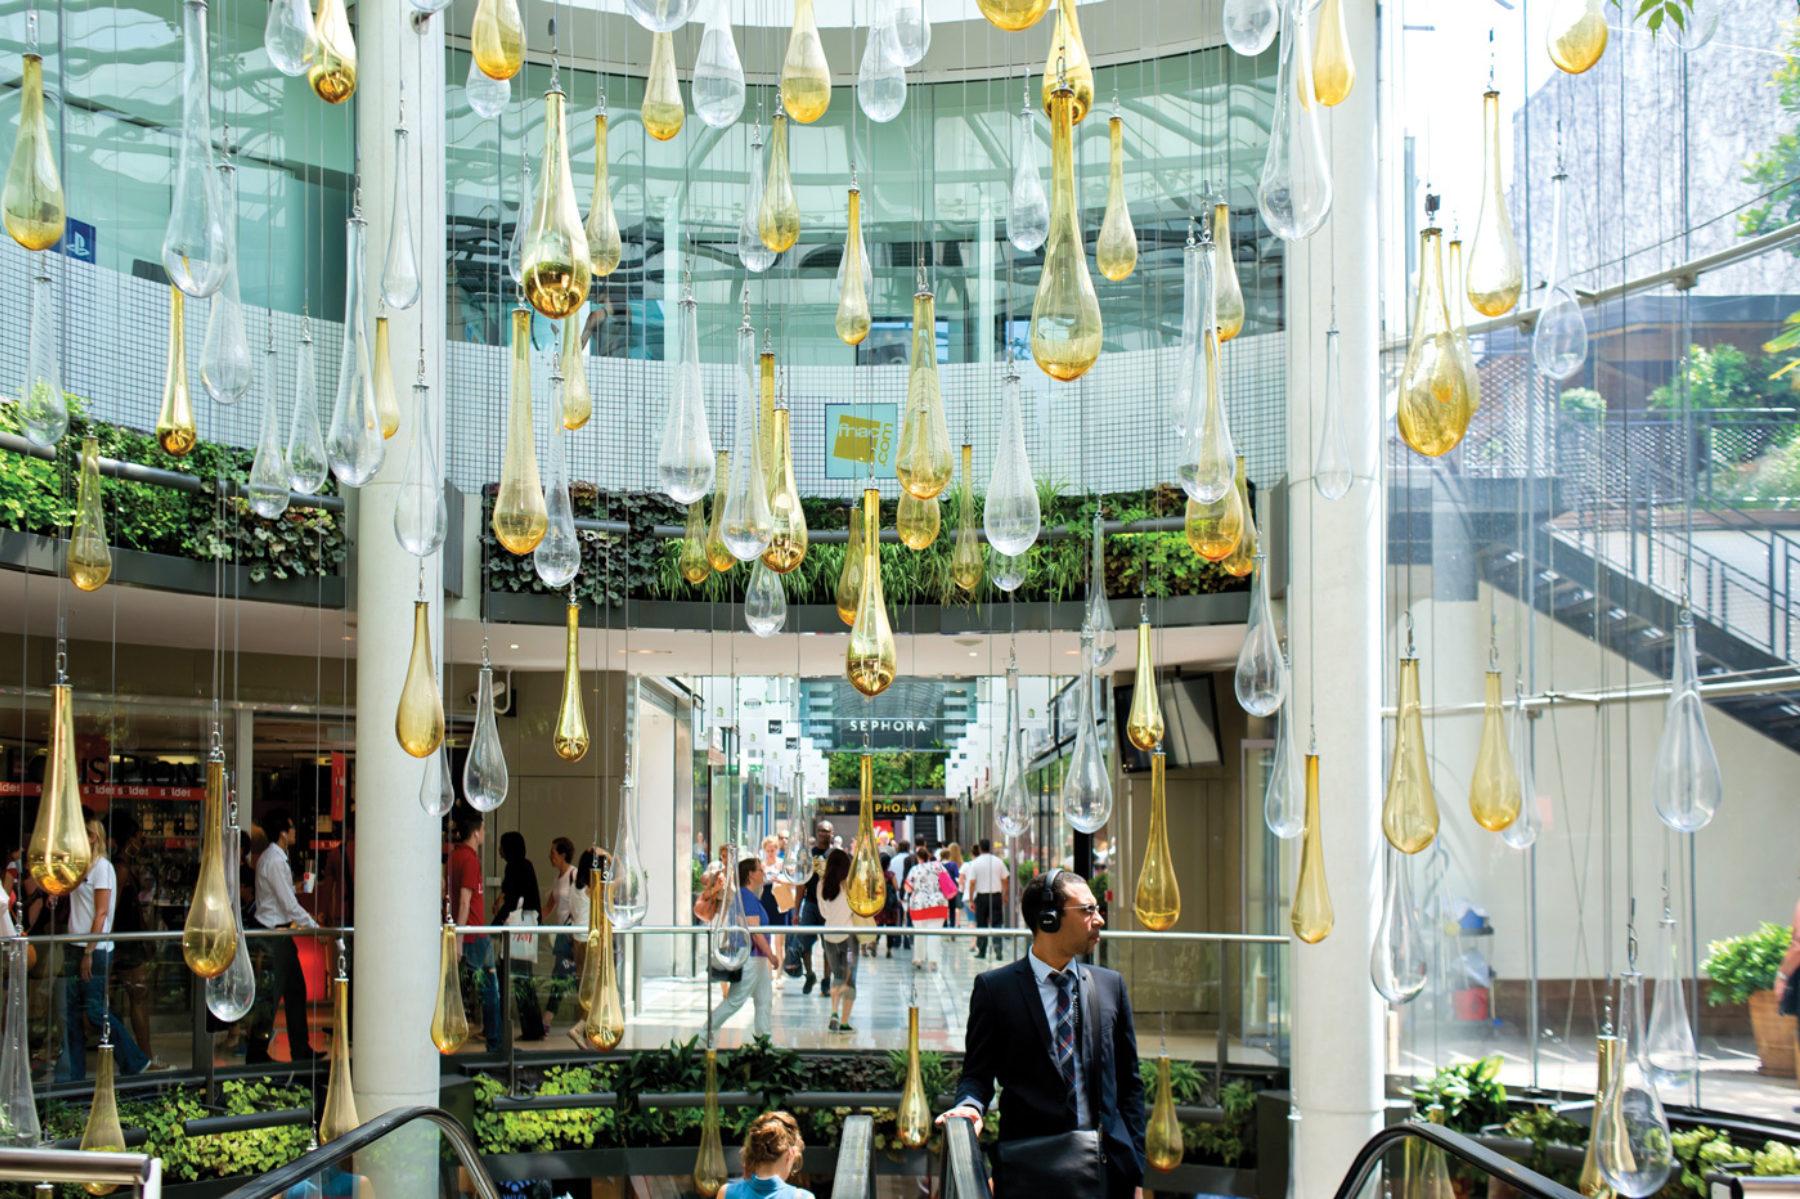 Passage du Havre Shopping Arcade